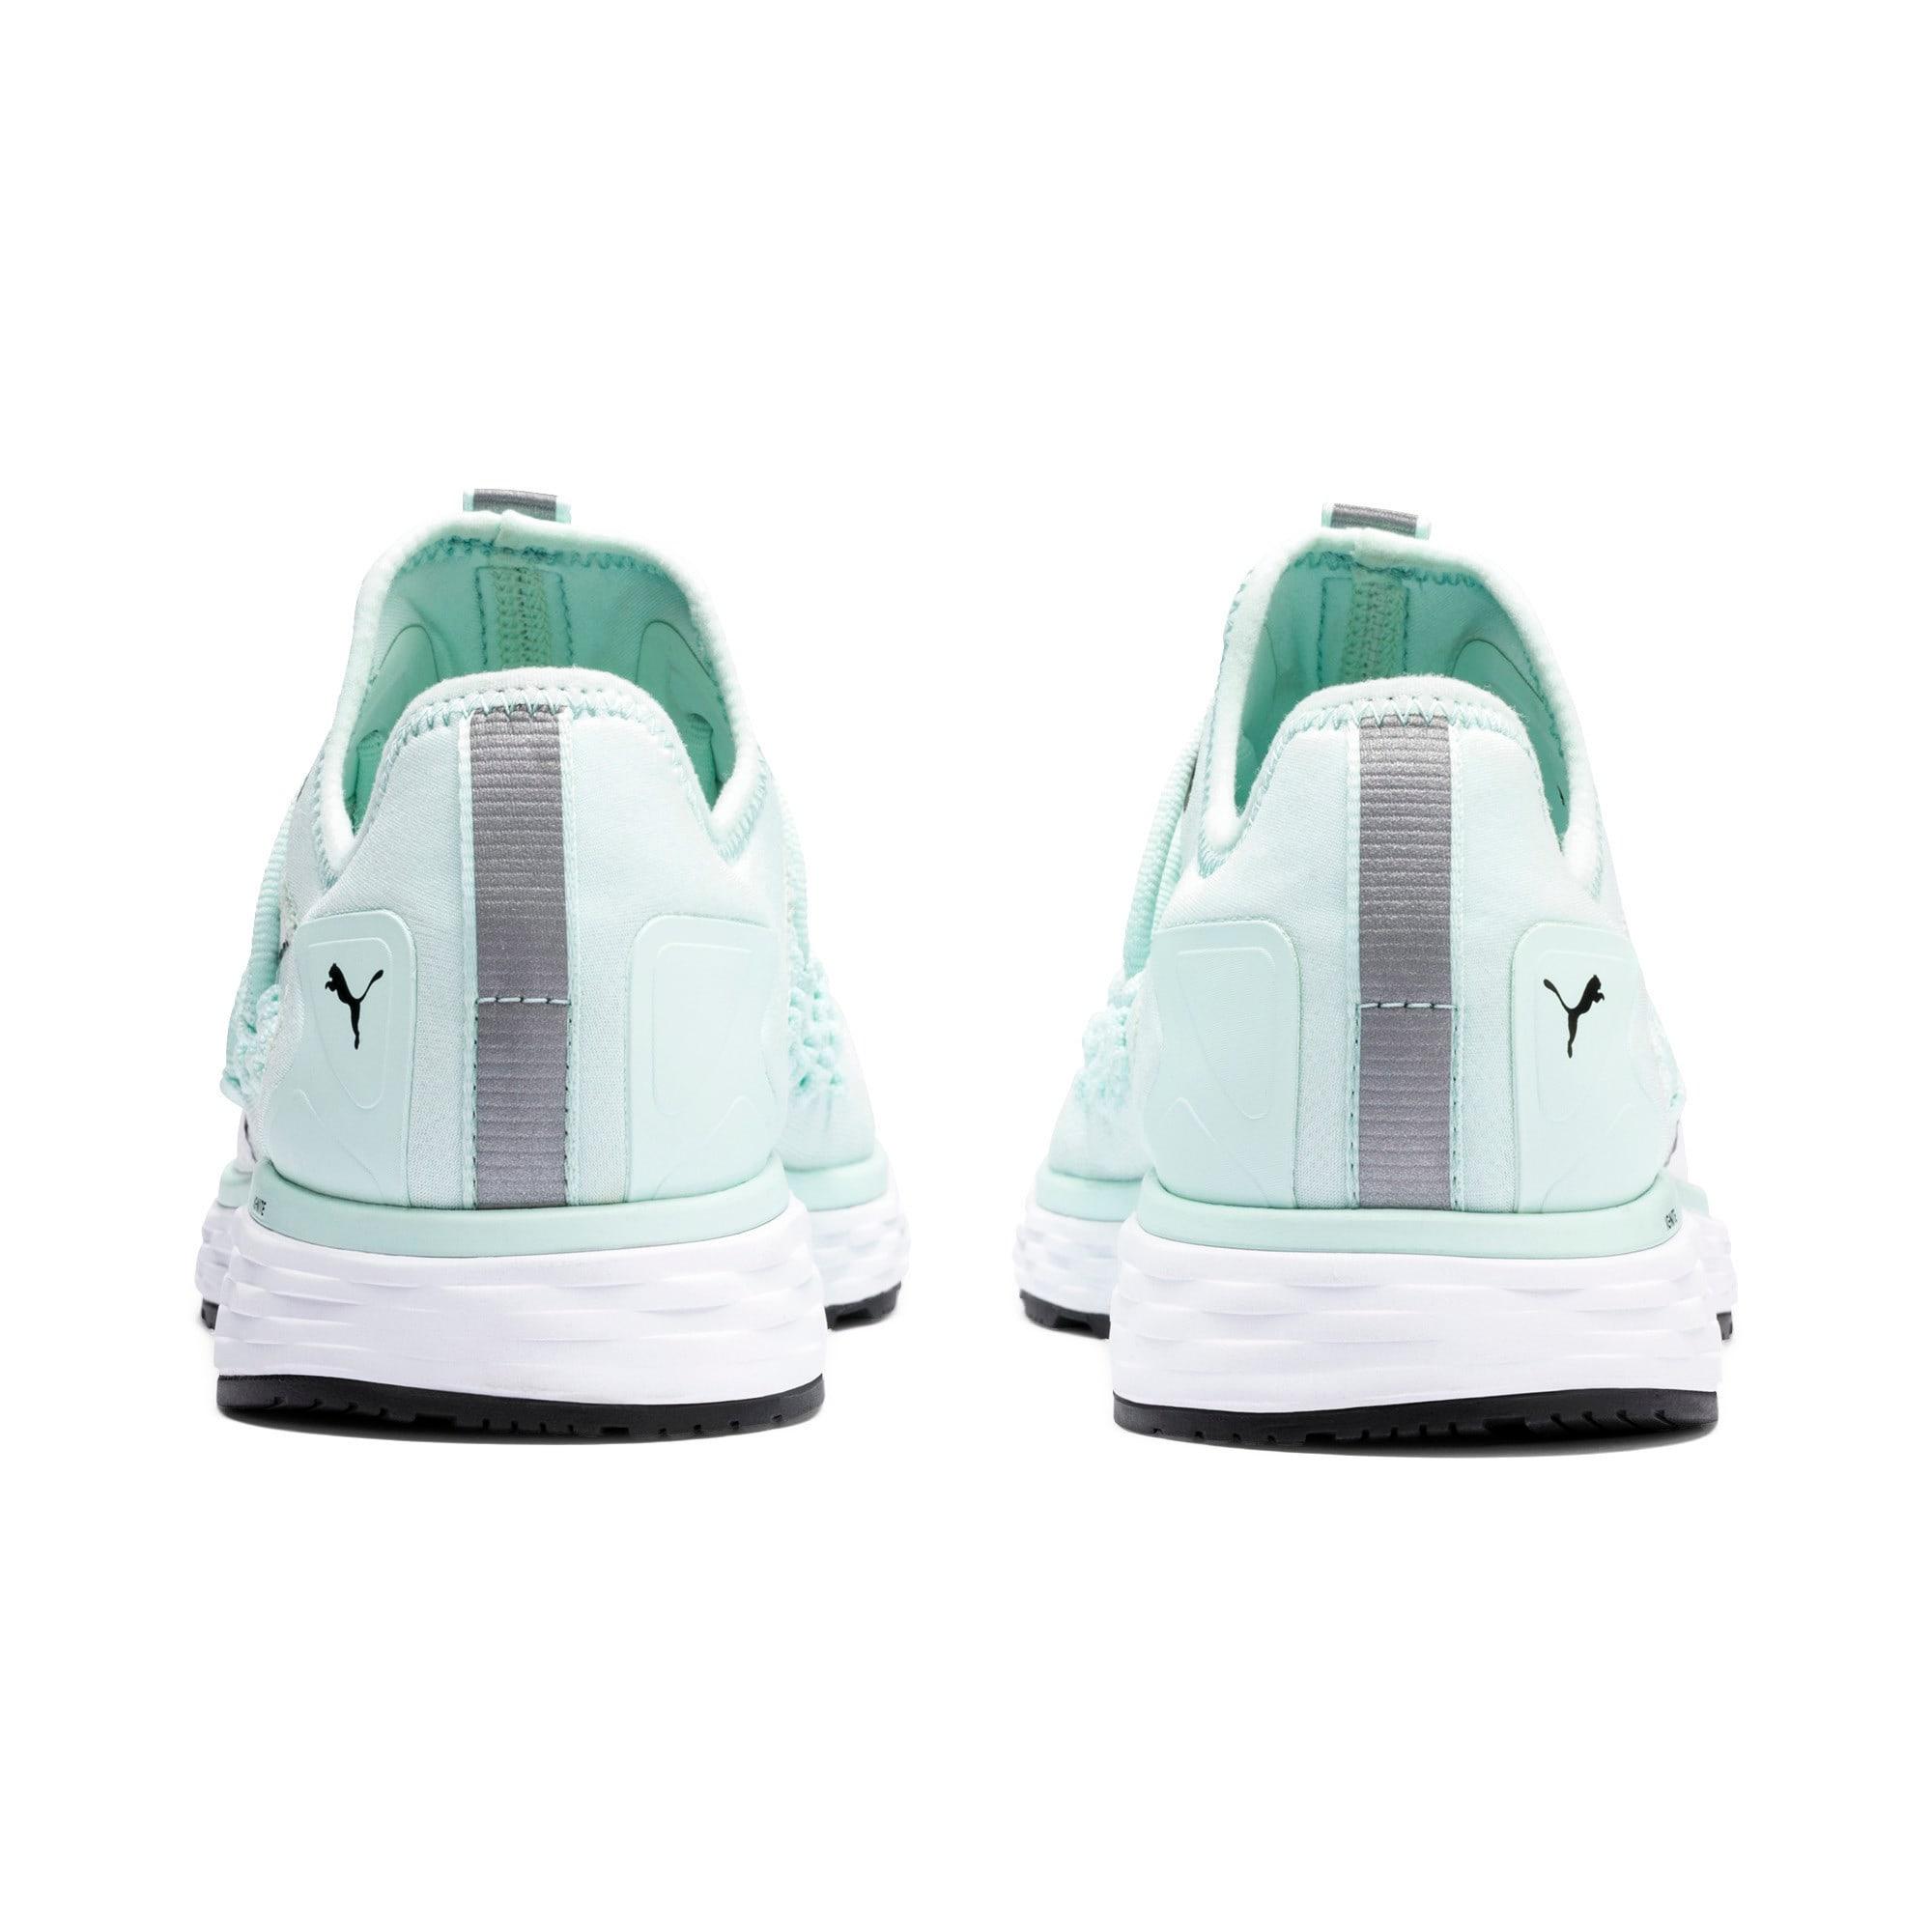 Thumbnail 3 of SPEED FUSEFIT Women's Running Shoes, Fair Aqua-Puma White, medium-IND